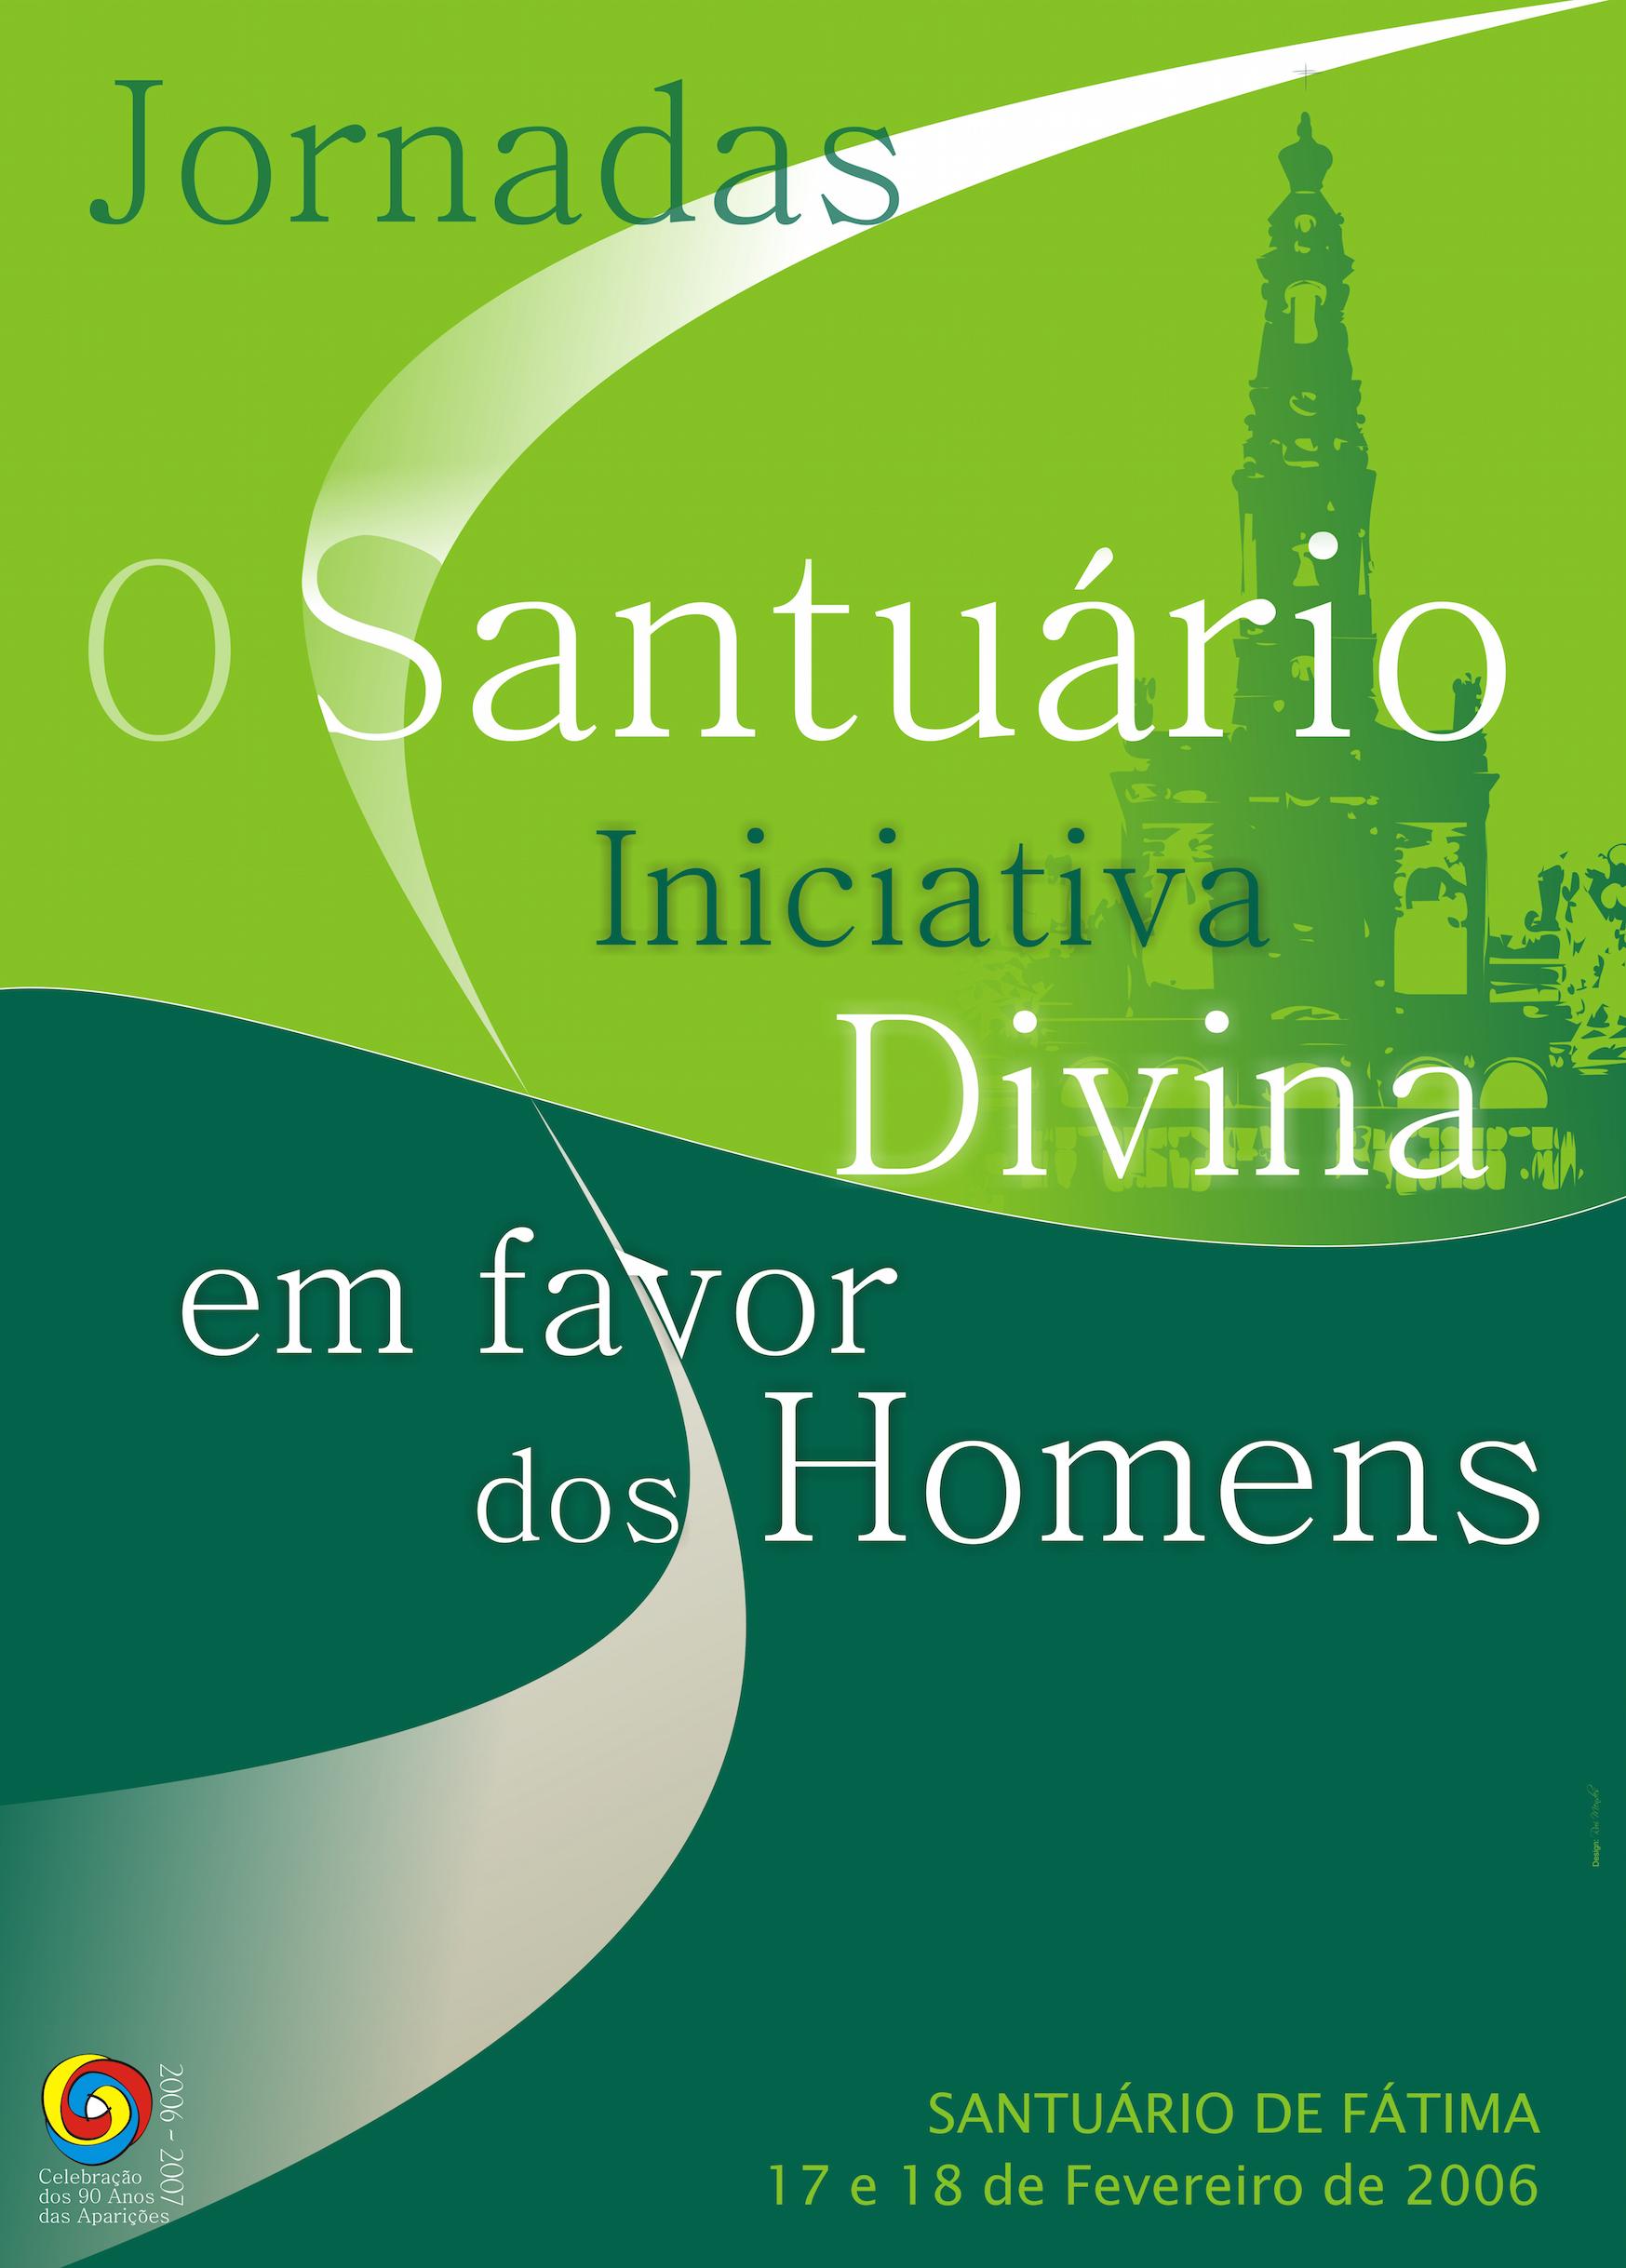 Jornadas 2006 O Santuario_cartaz.jpg